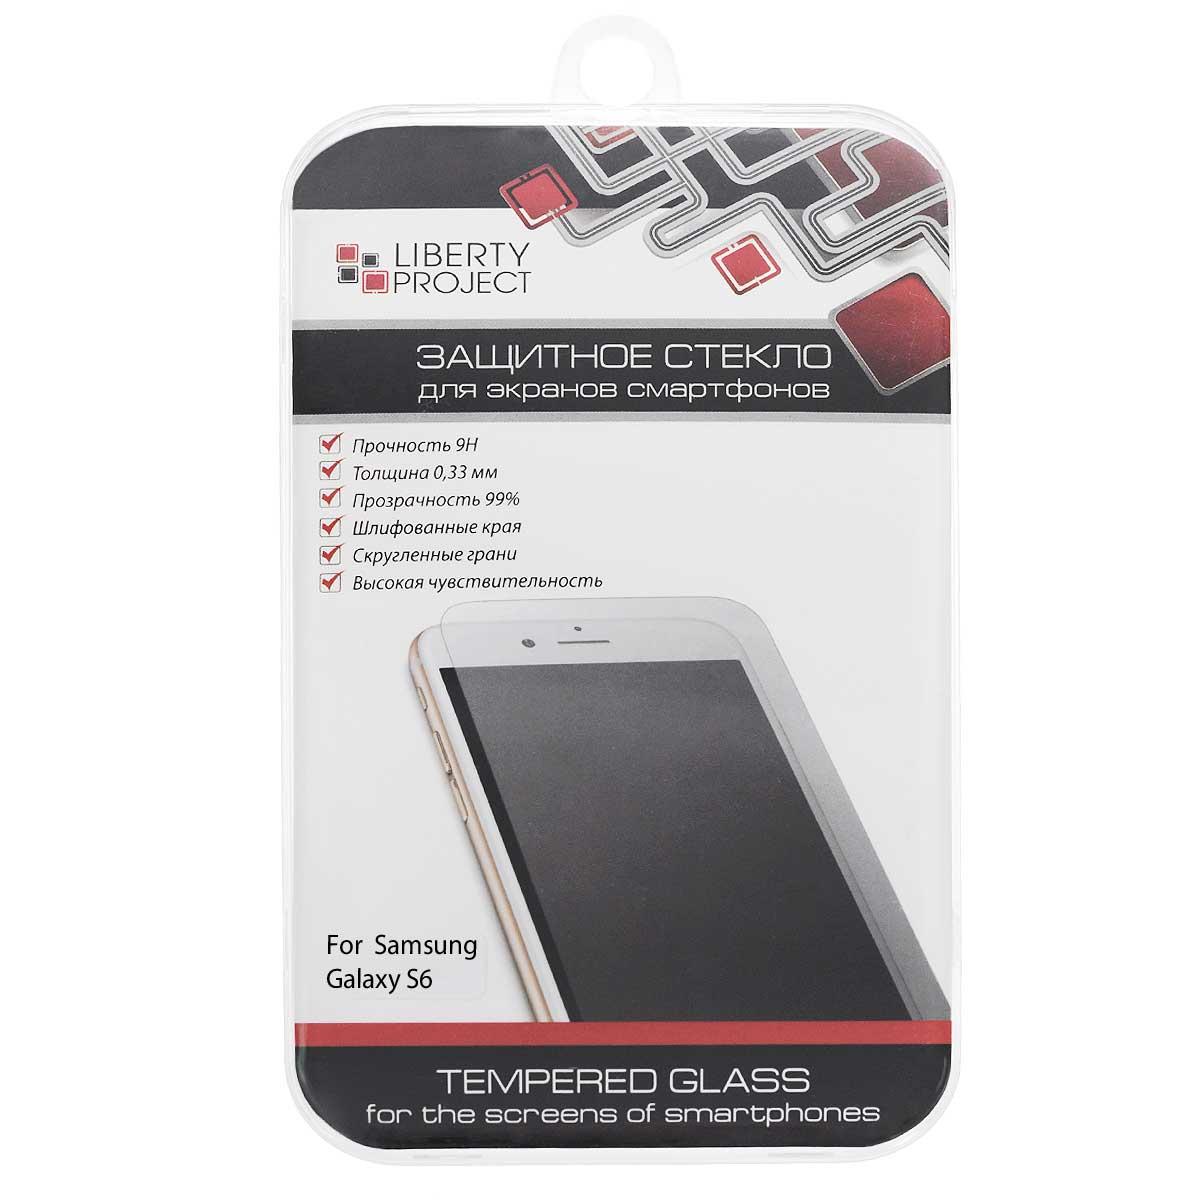 Liberty Project Tempered Glass защитное стекло для Samsung Galaxy S6, Clear (0,33 мм) liberty project tempered glass защитное стекло для samsung galaxy a3 clear 0 33 мм